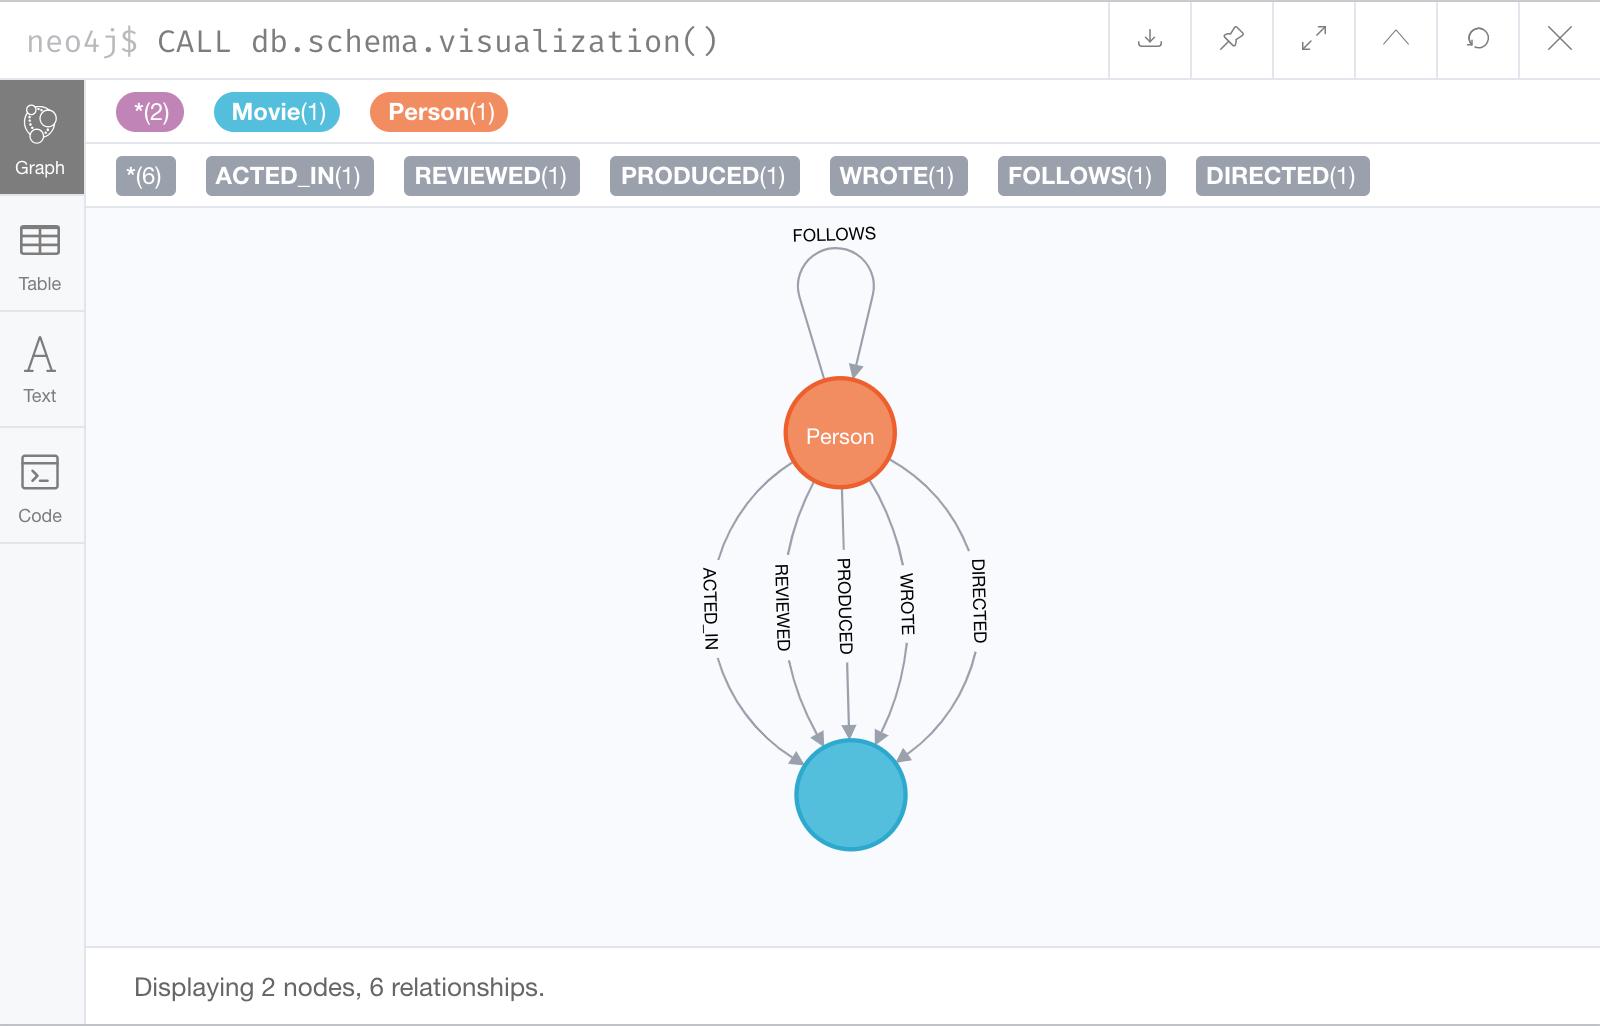 call_db.schema.visualization